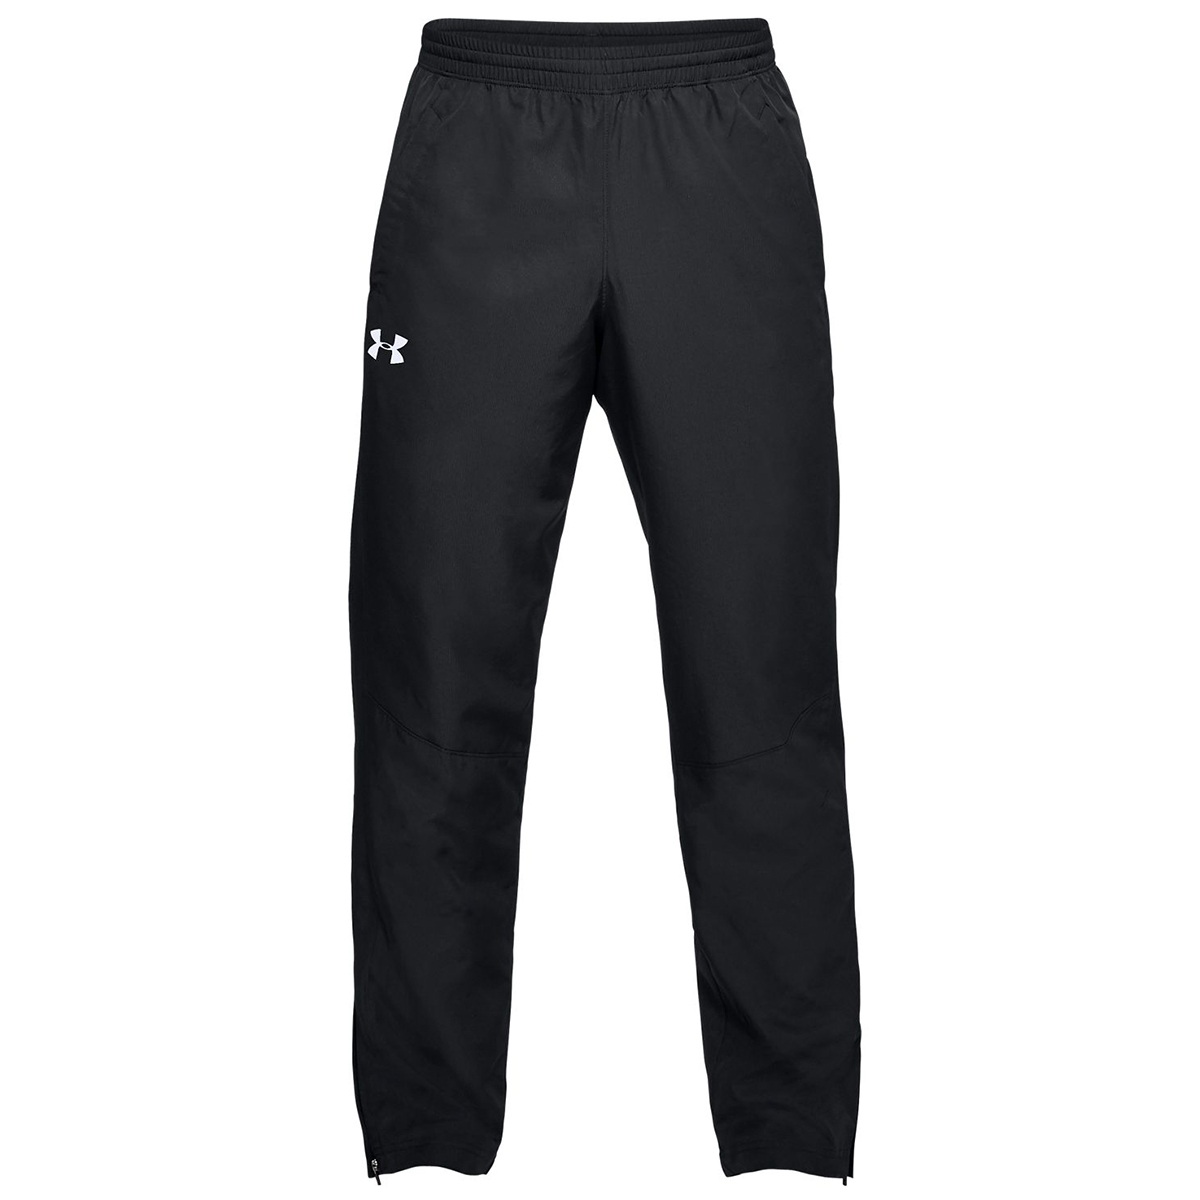 Under Armour Men's Sportstyle Woven Pants - Black, XXL